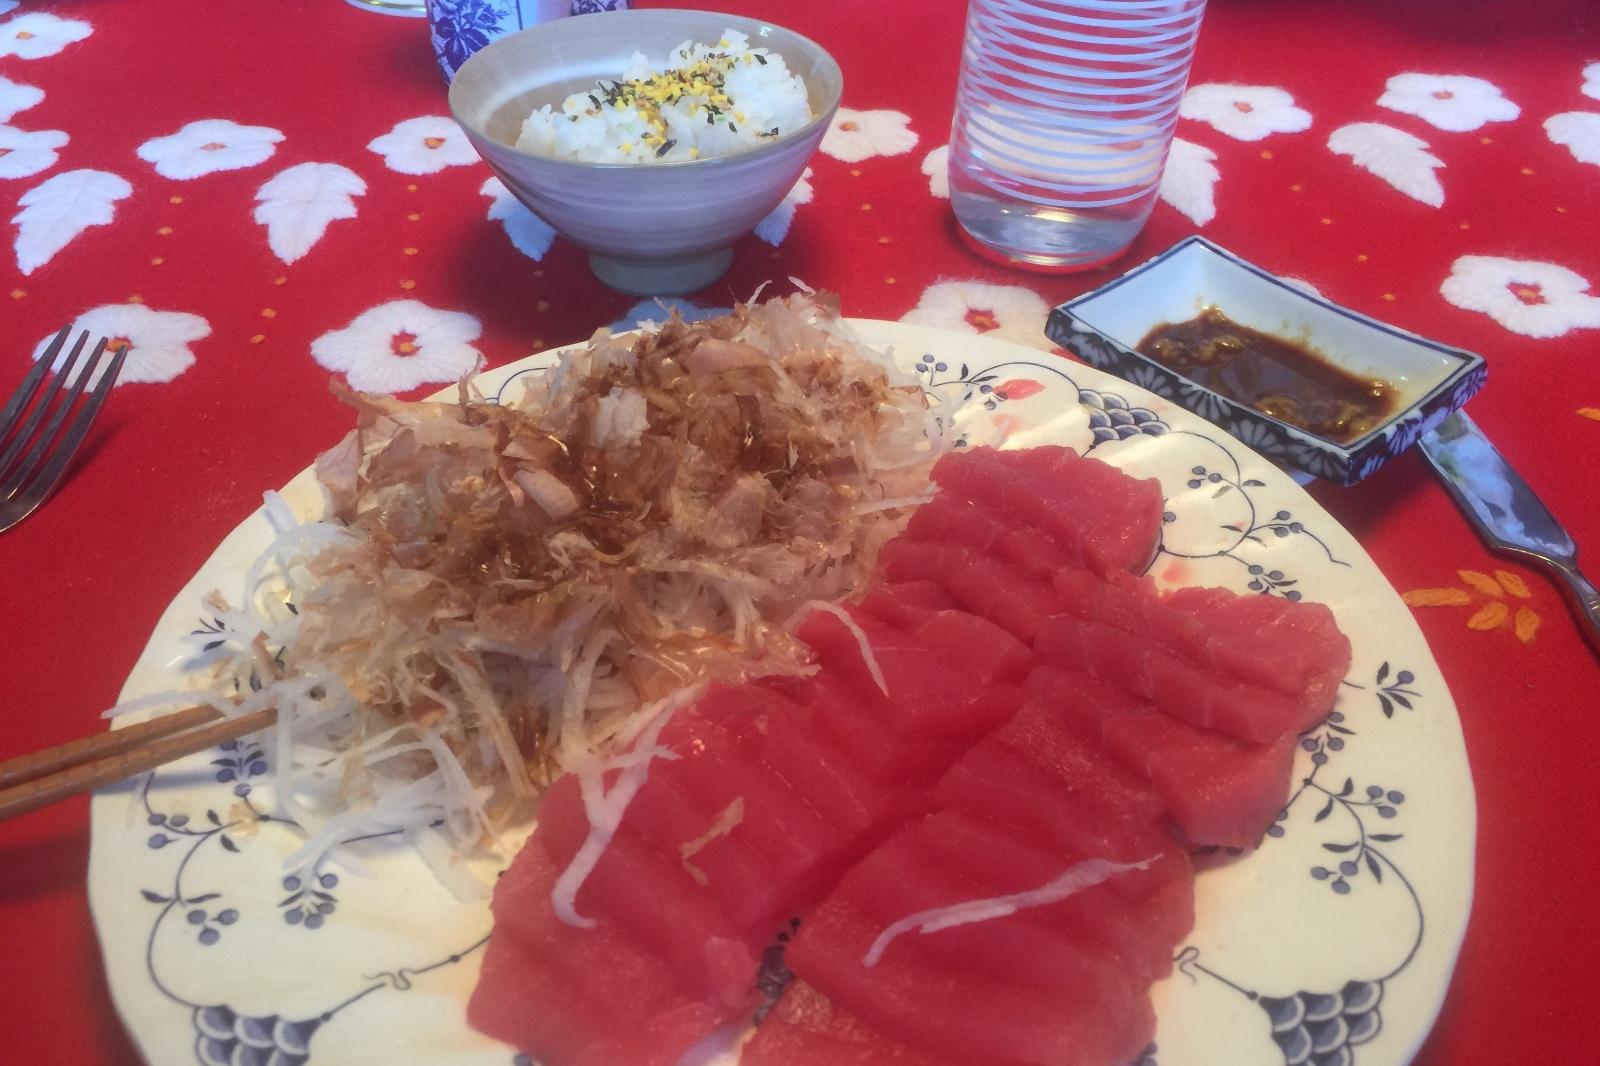 http://blog.rickk.com/food/2015/11/28/ate.2015.11.27.l.jpg